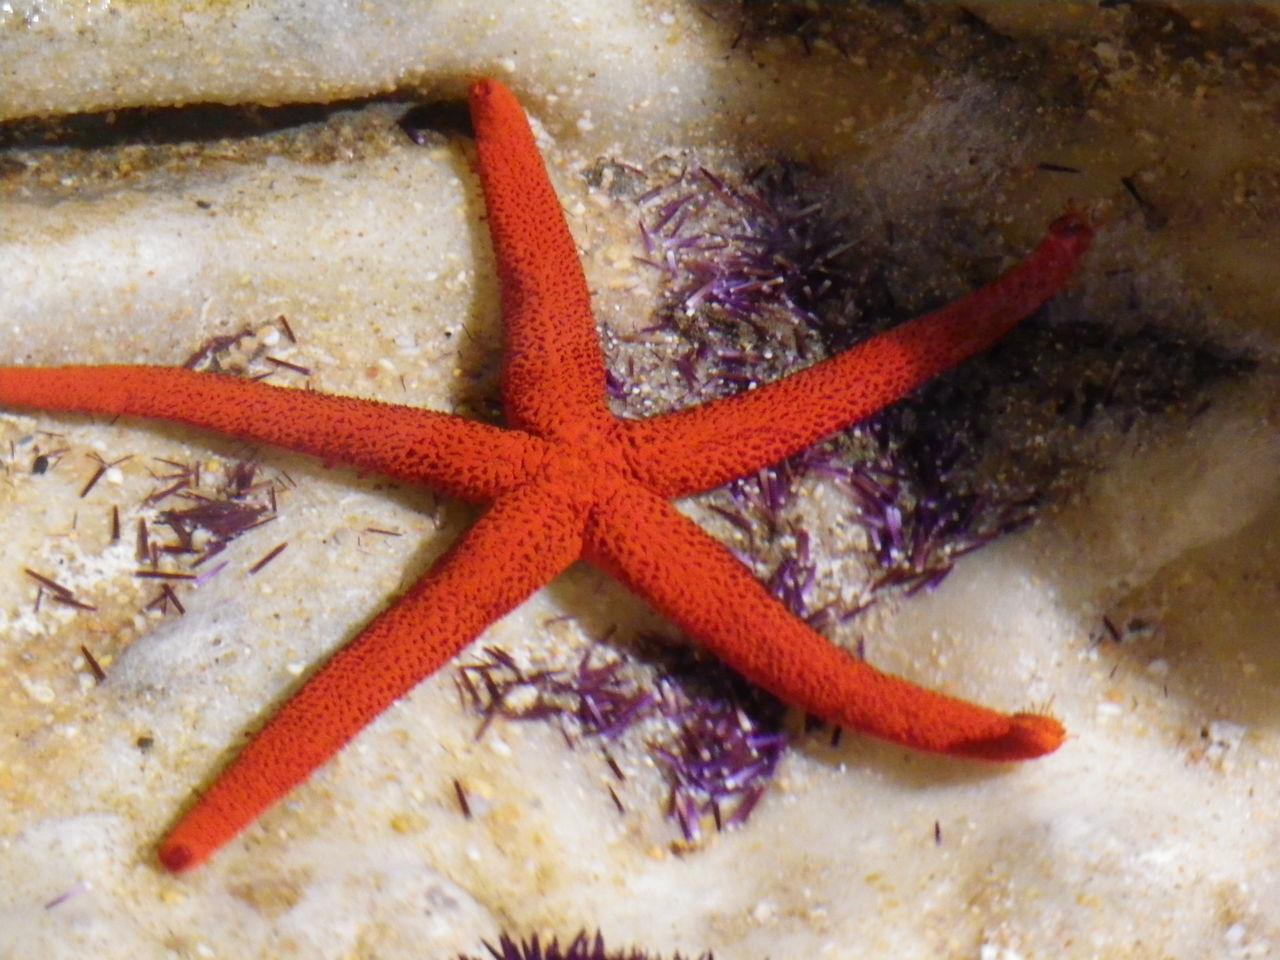 red starfish Close-up Multi Colored Nature Red Sea Life Sea_bed Starfish  White Color